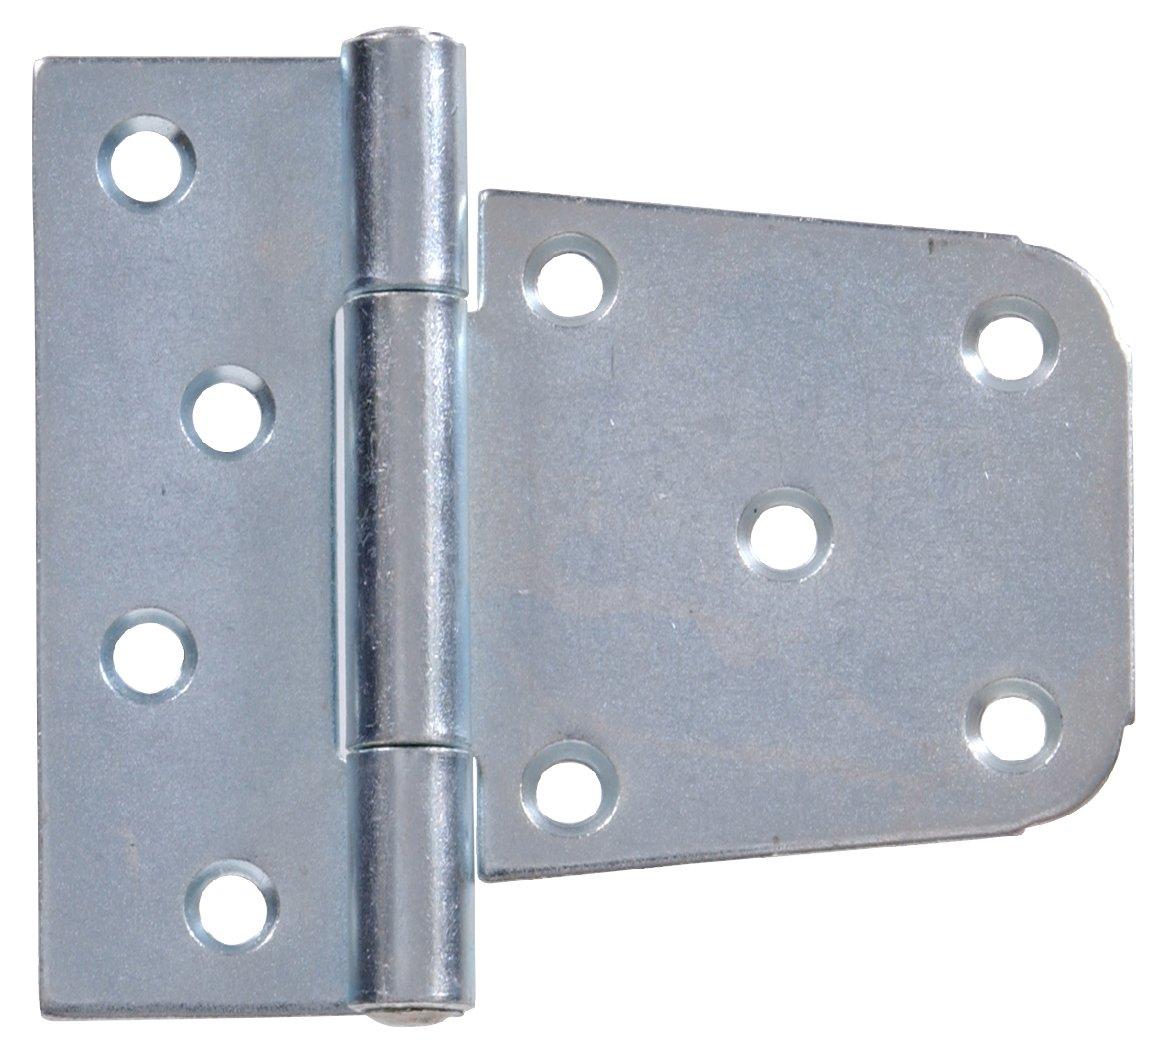 The Hillman Group 851948 T Hinge Heavy Zinc 4X4 2X4 1 Pack